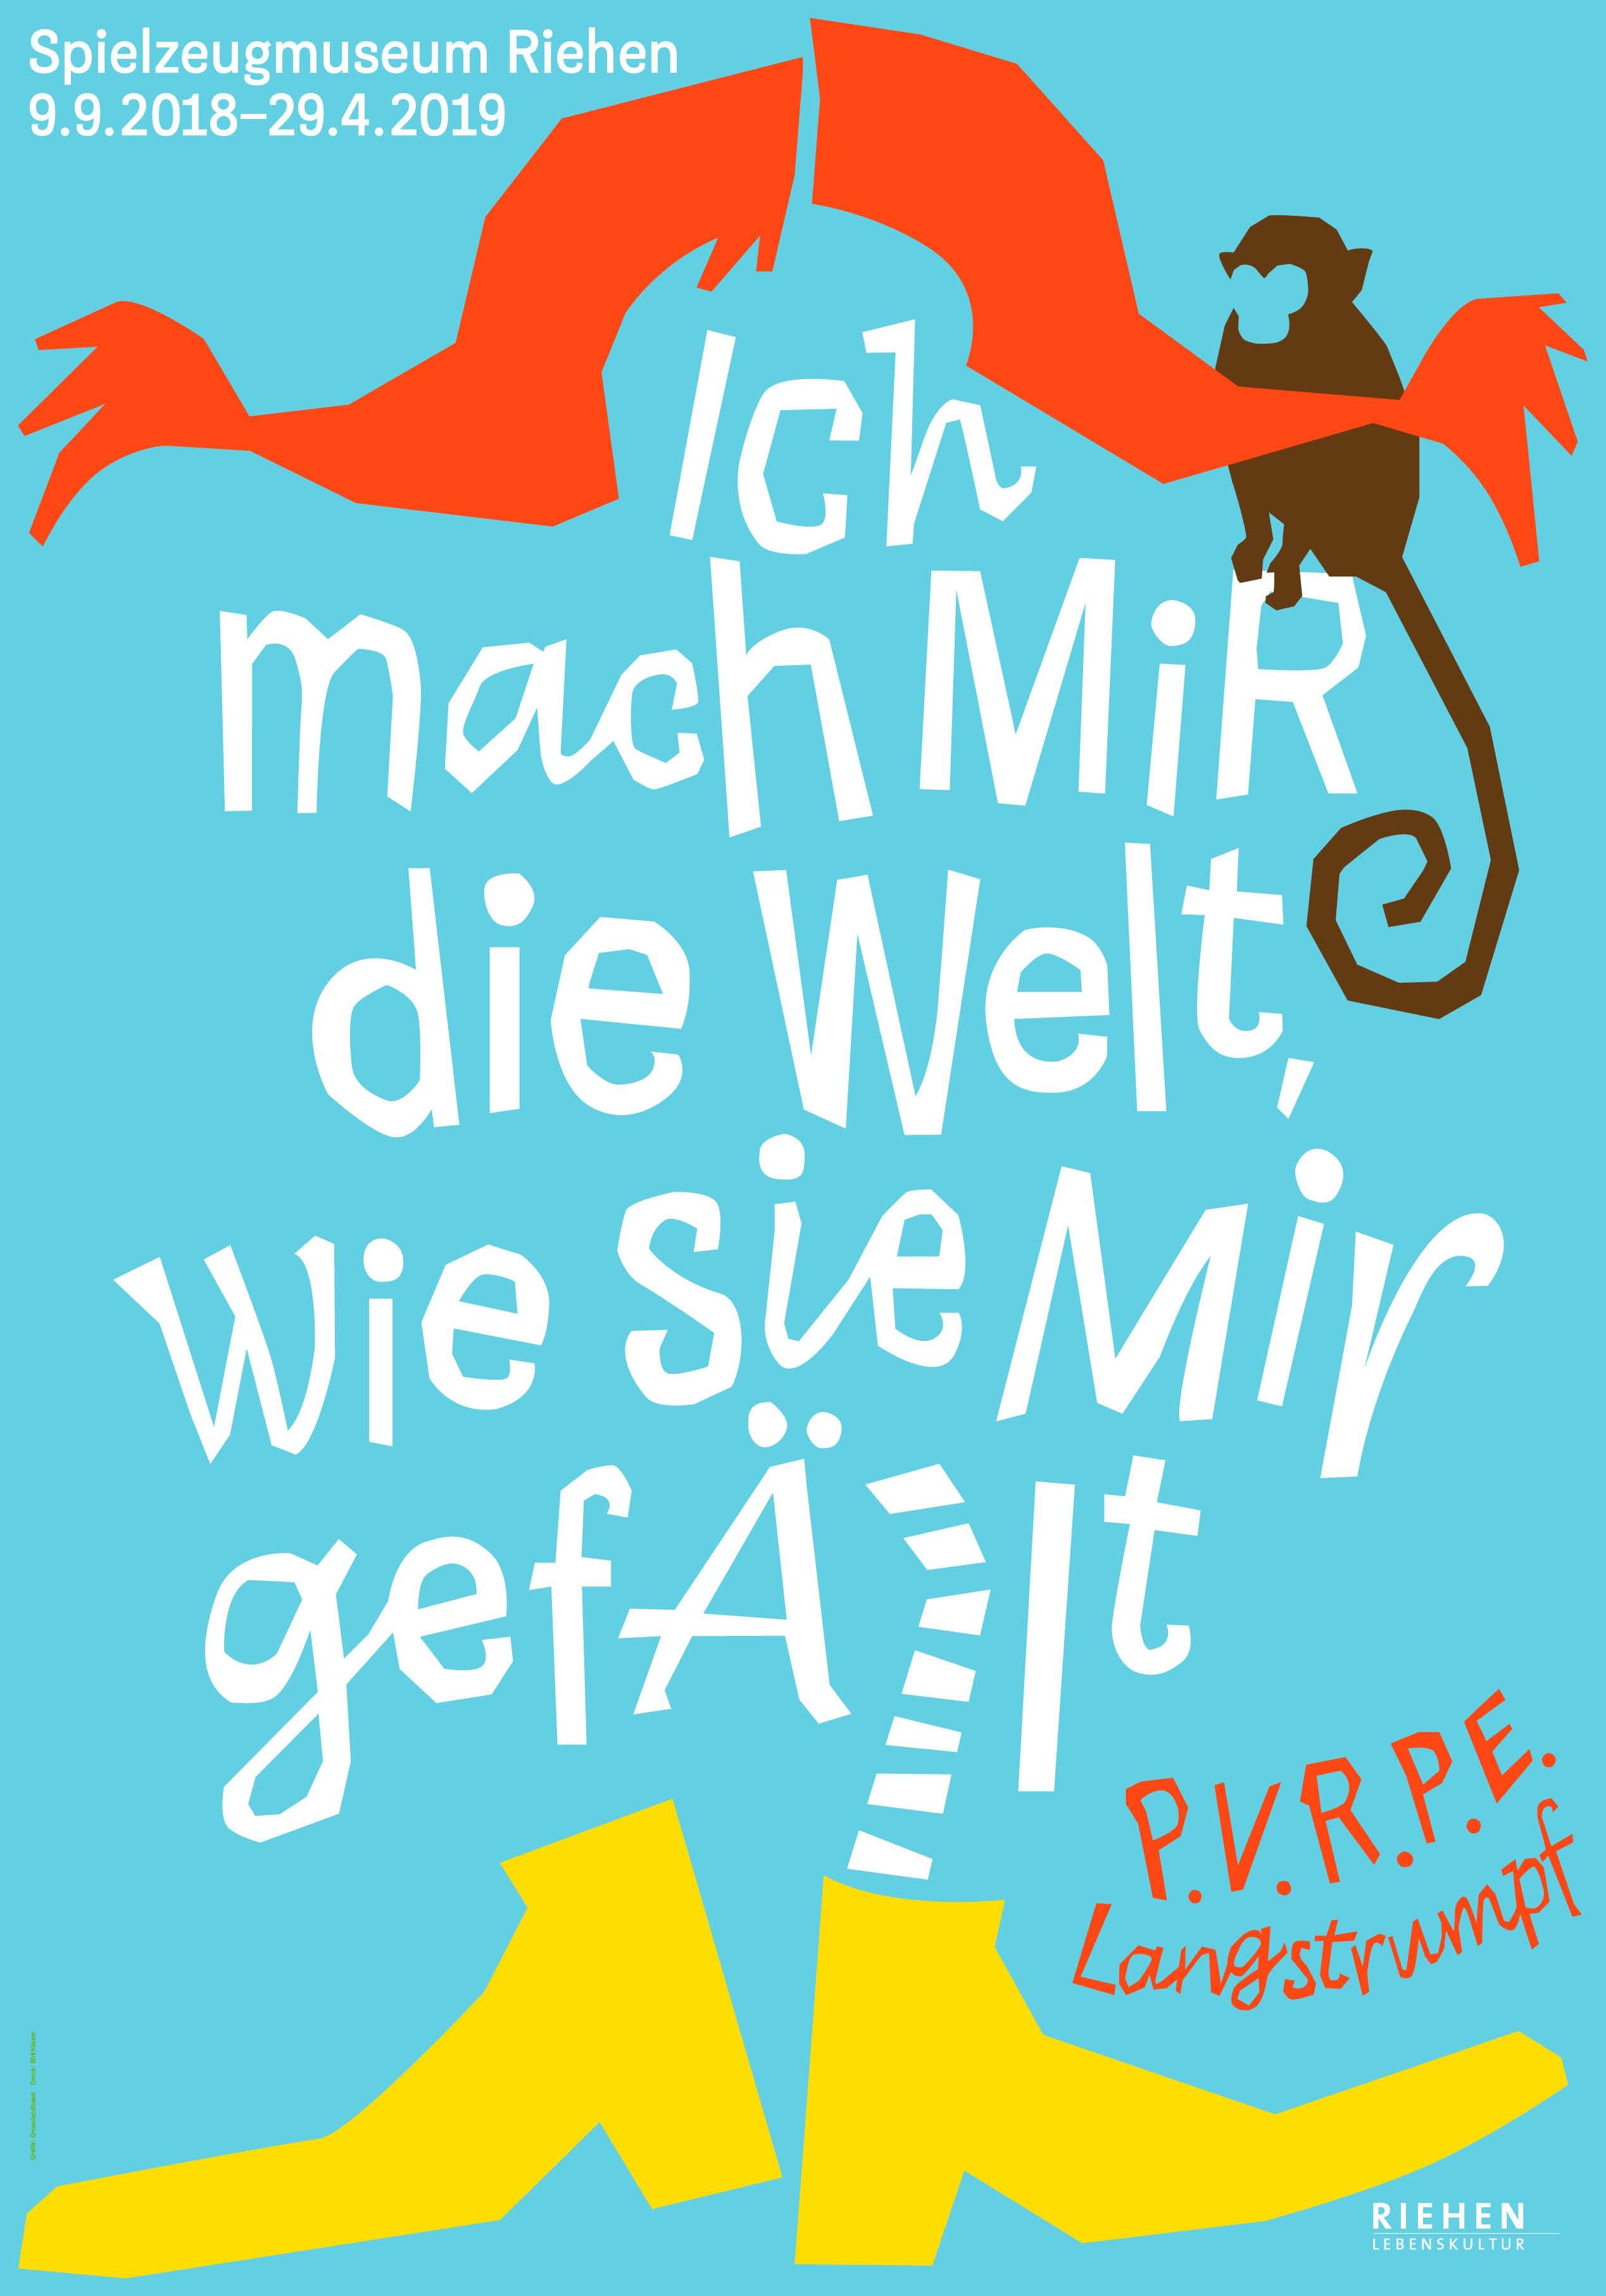 180802 Pippi Plakat F4 Rz